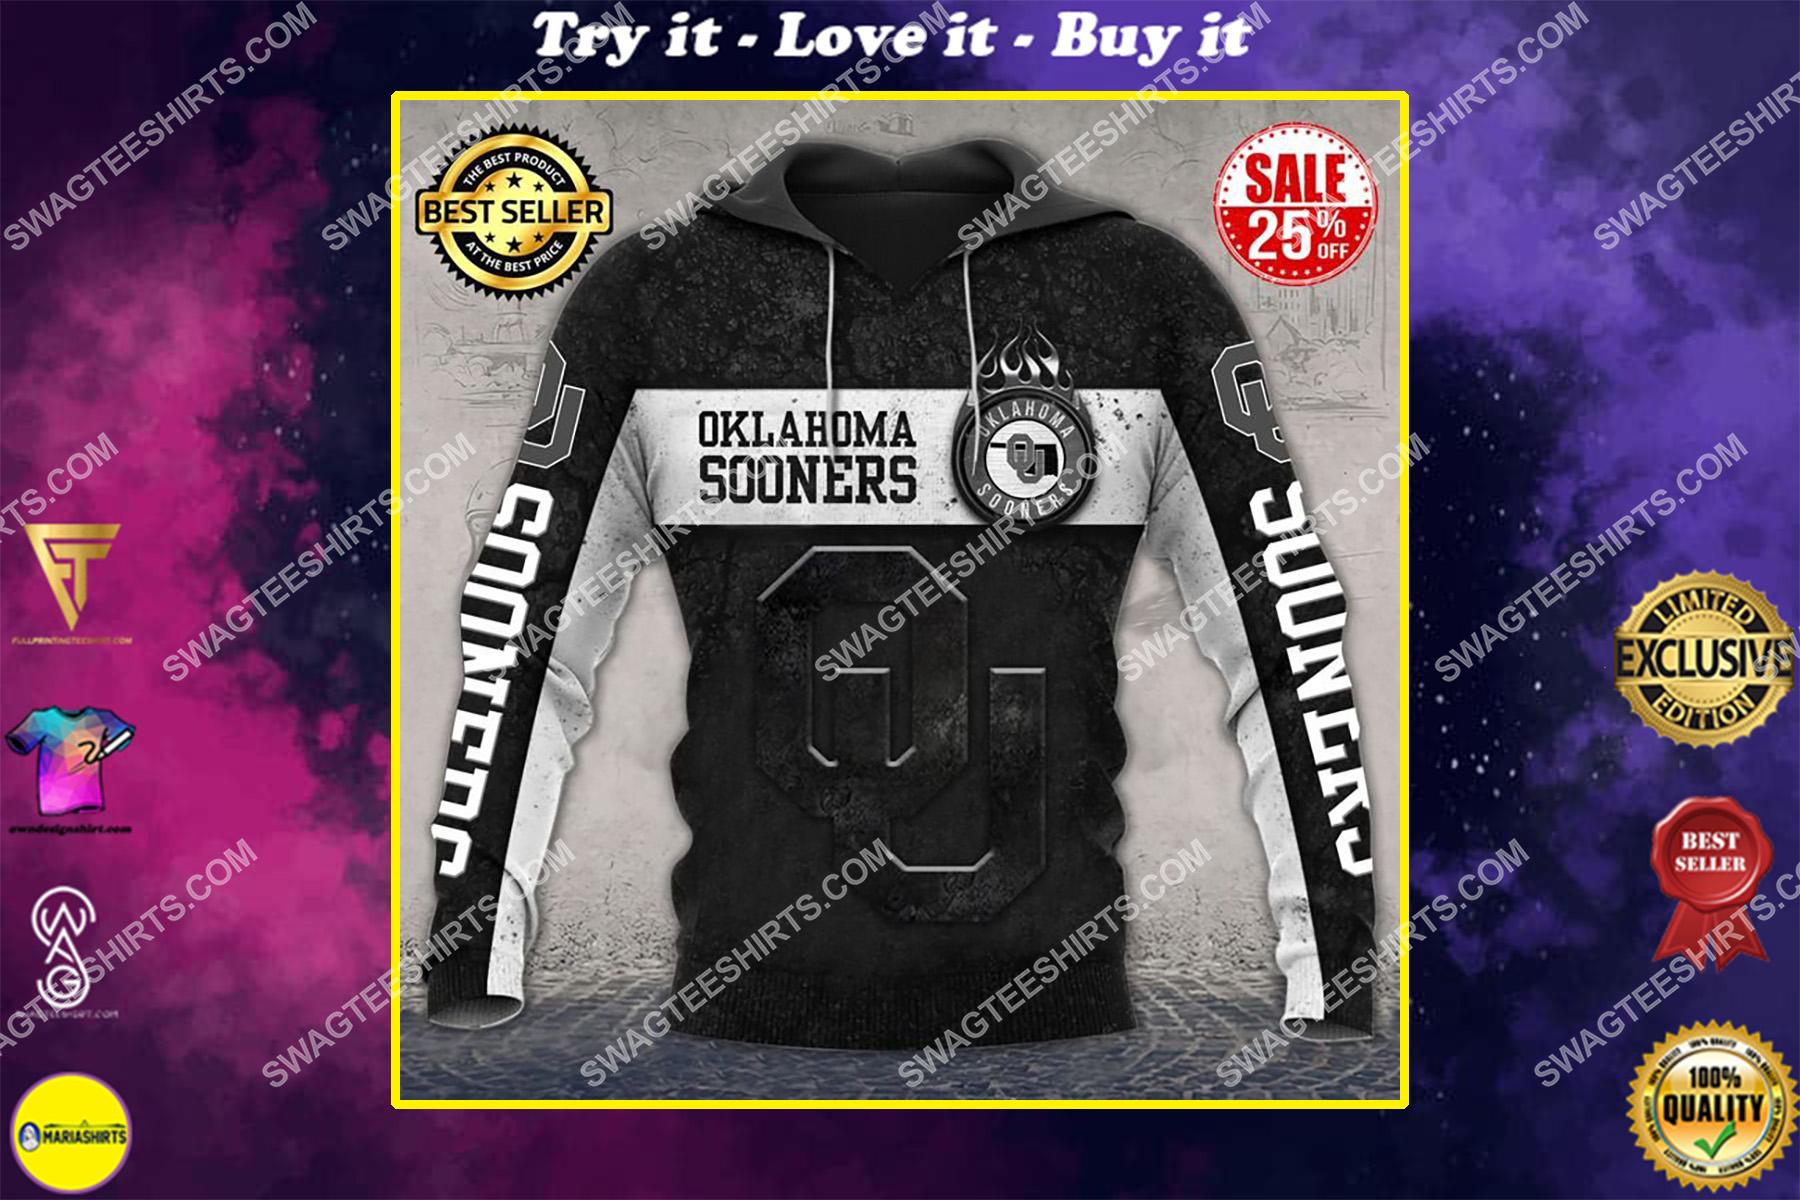 oklahoma sooners football team all over printed shirt